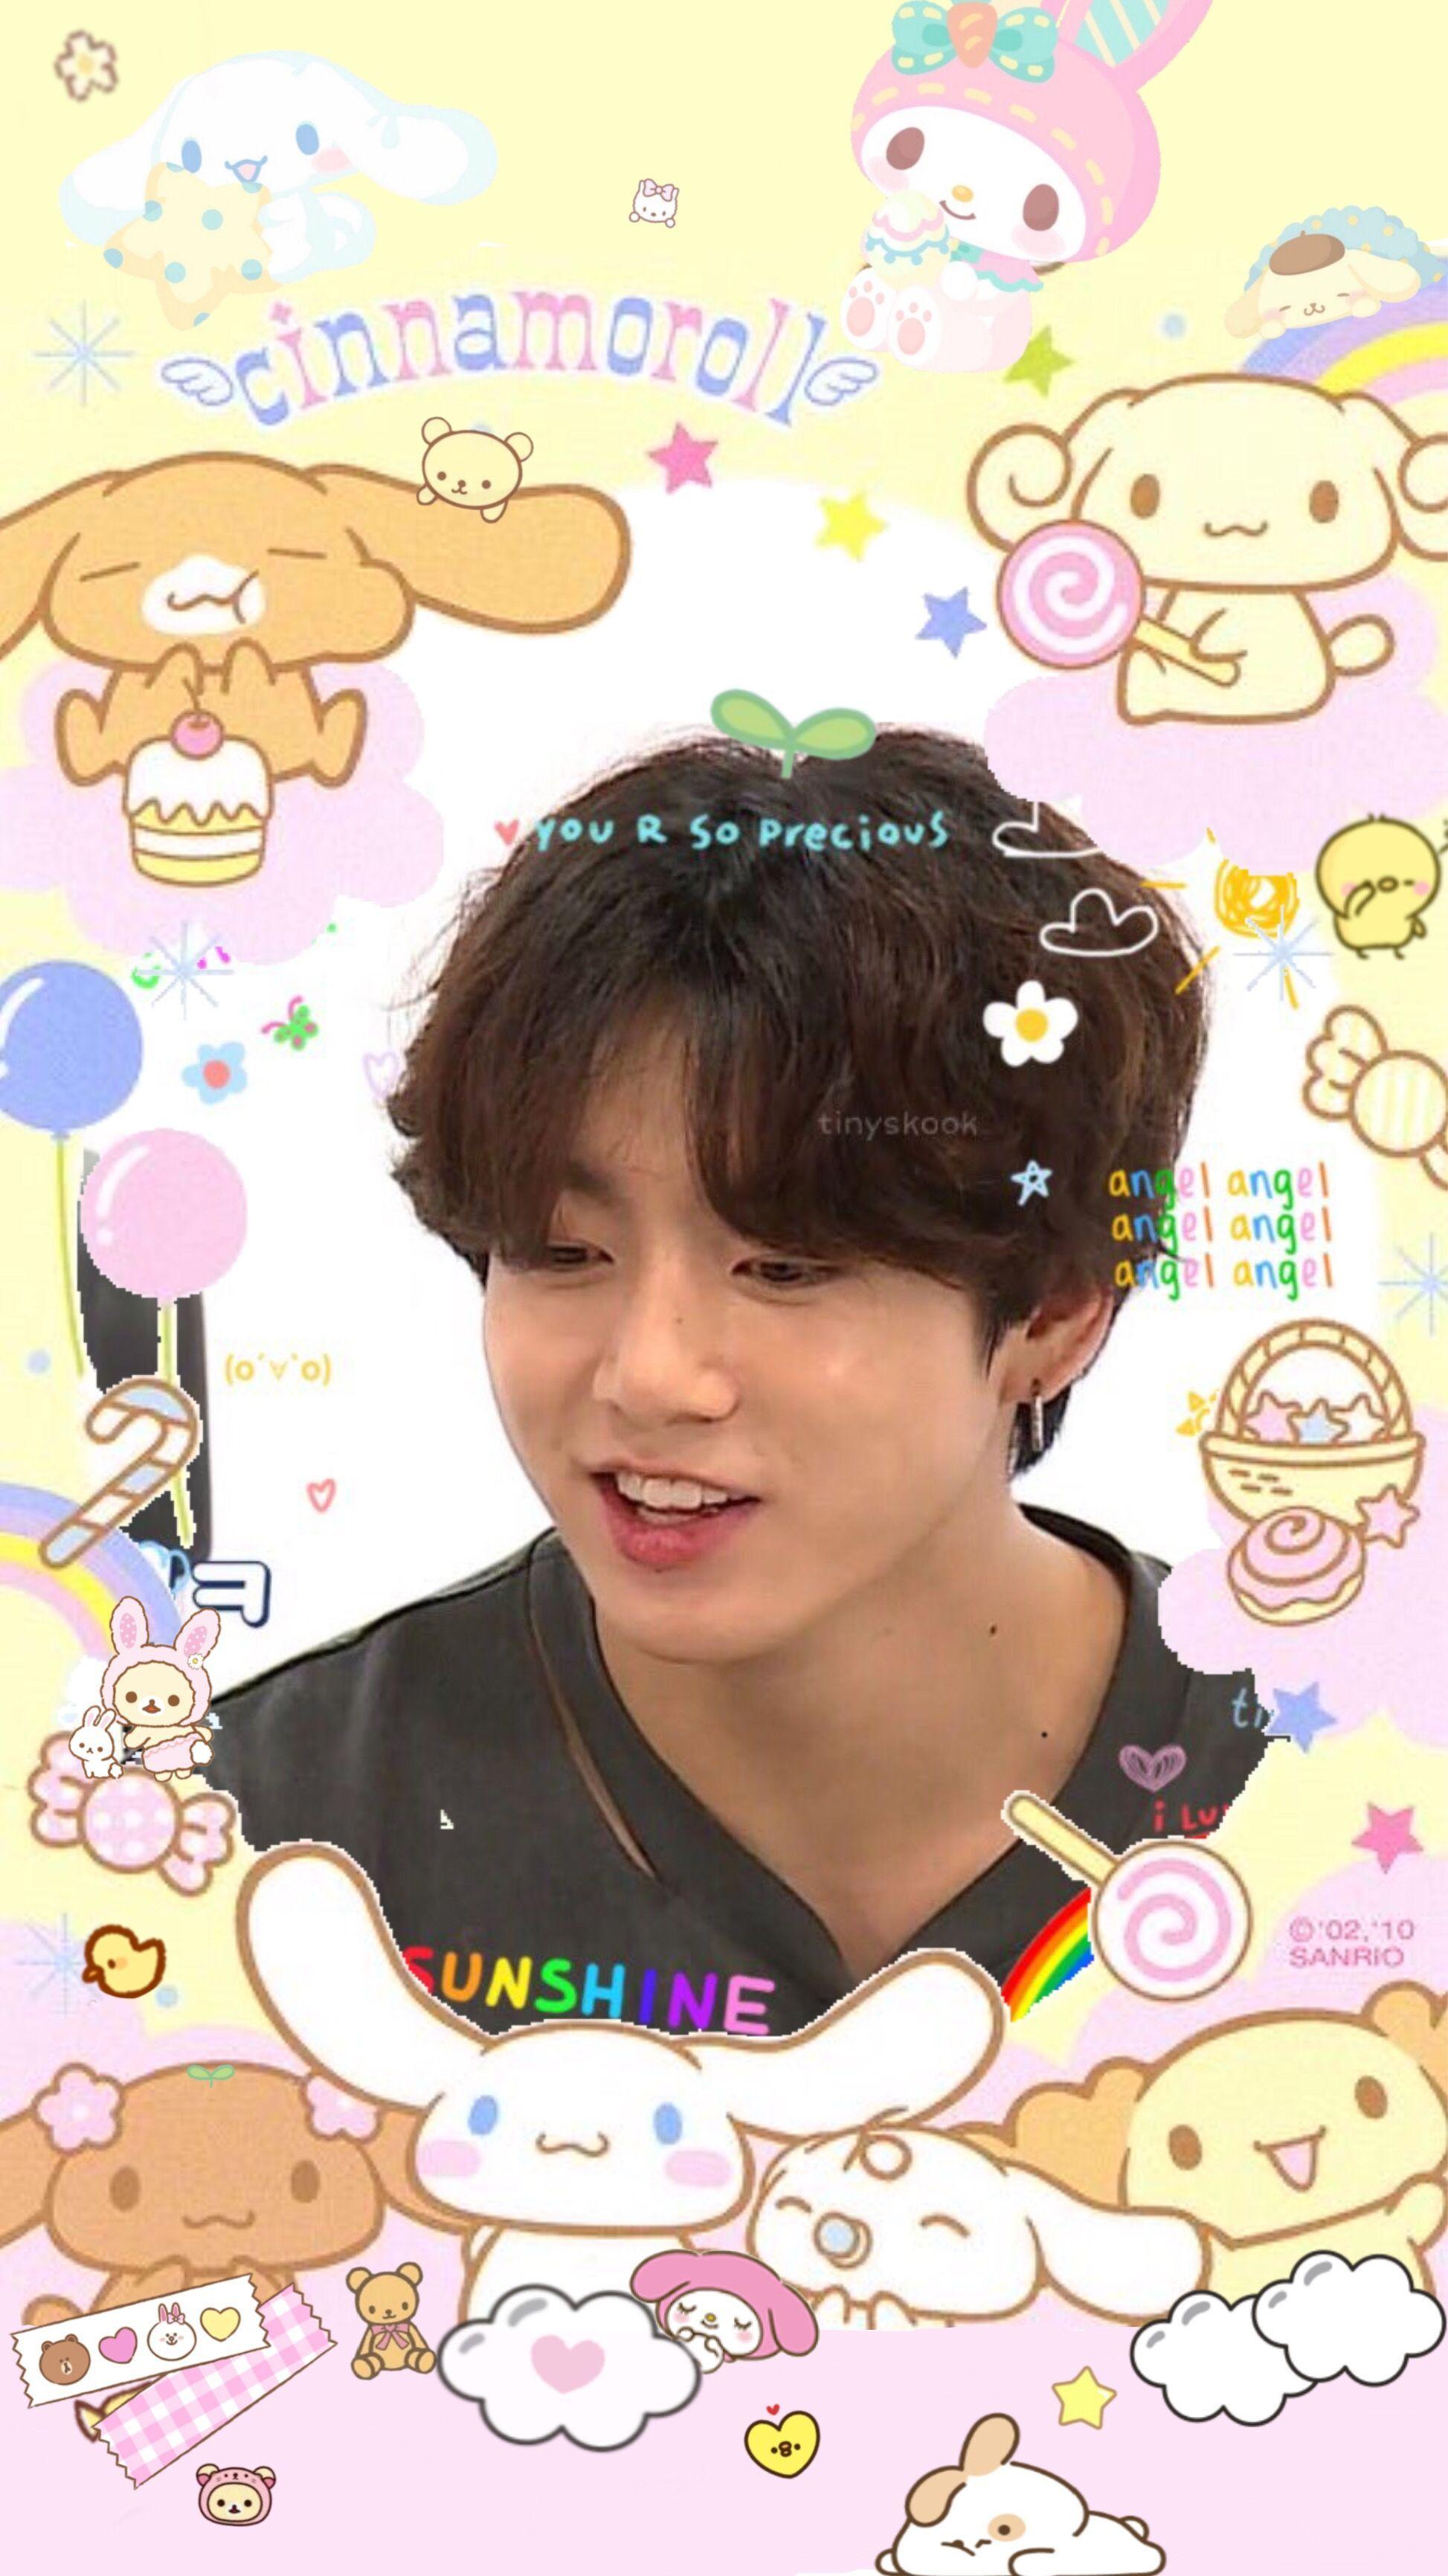 𝘾𝙪𝙩𝙚 Bts Wallpaper Jungkook Cute Cute Wallpapers